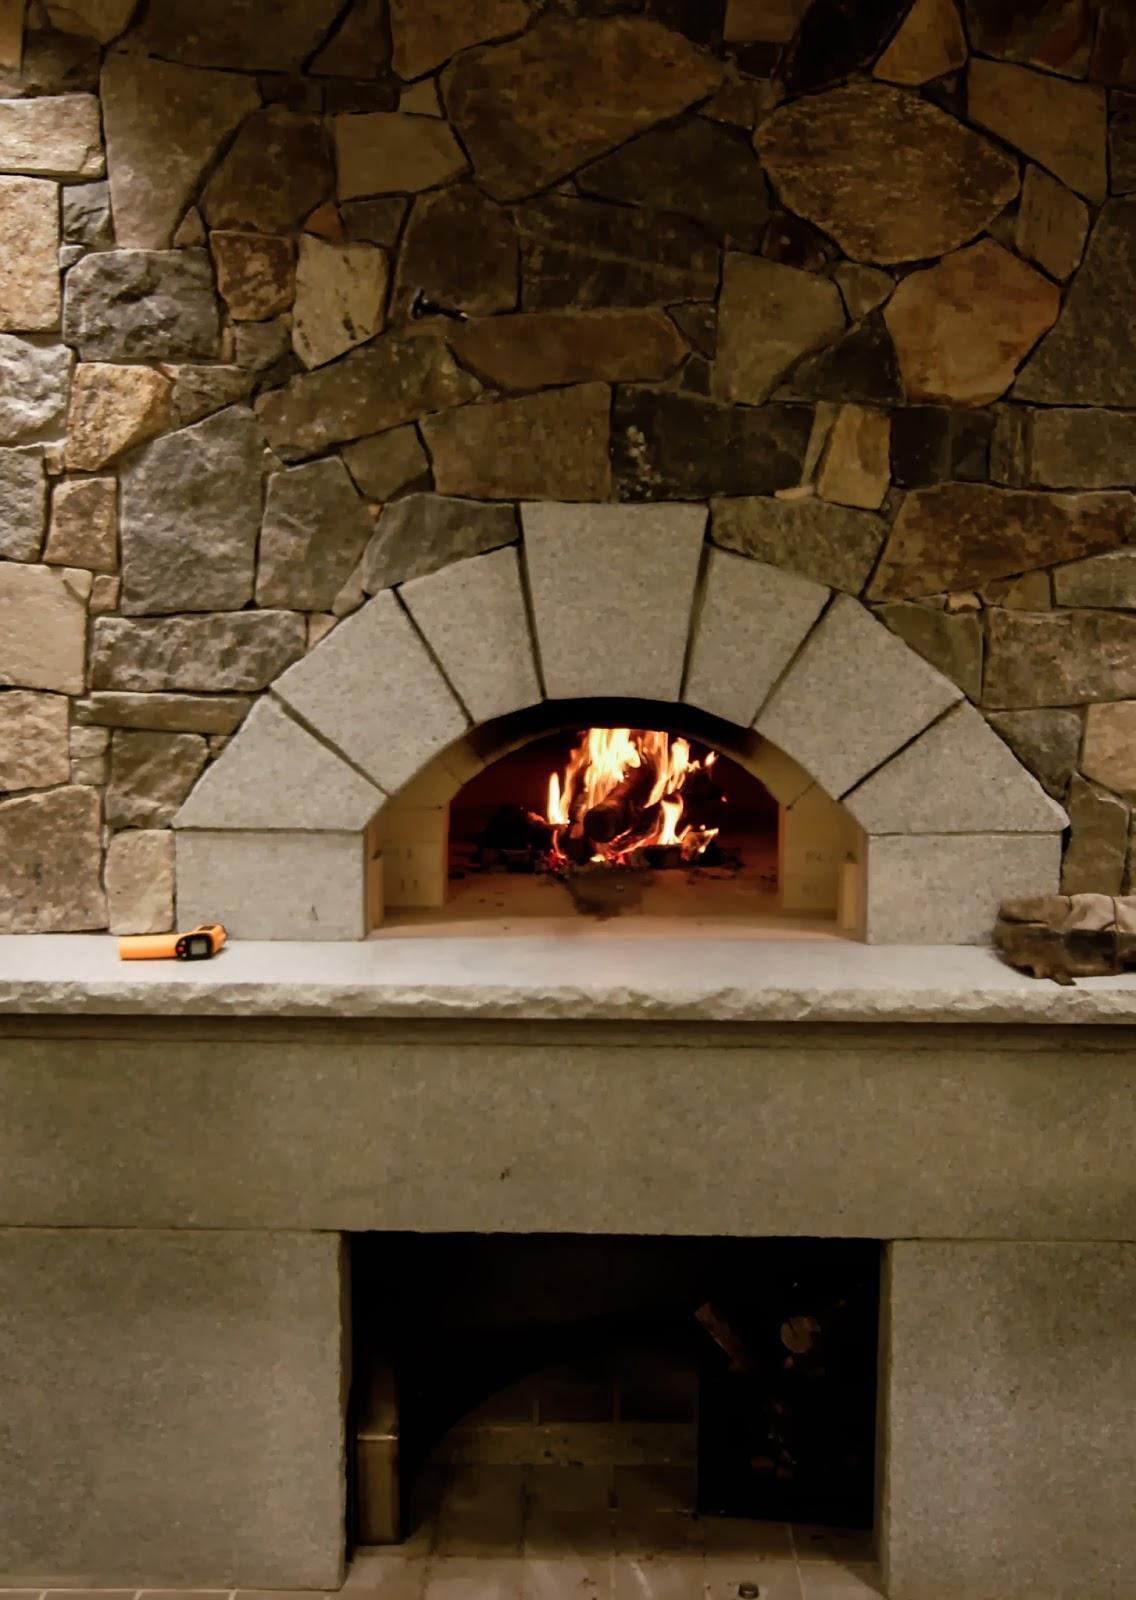 True Brick Ovens Build Your Own Brick Oven